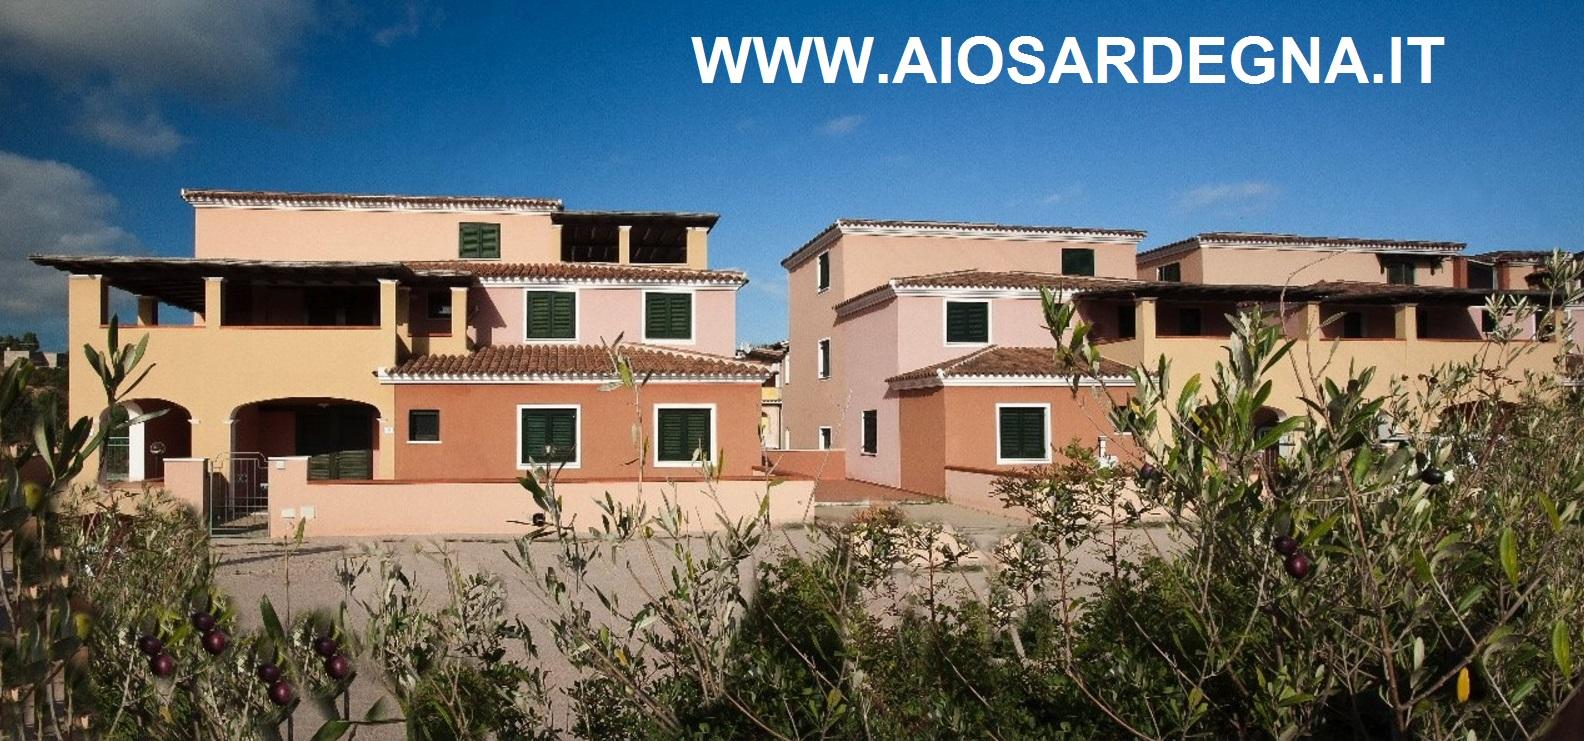 Wohnung Urlaub Cala Liberotto 3 zimmer 5 pax